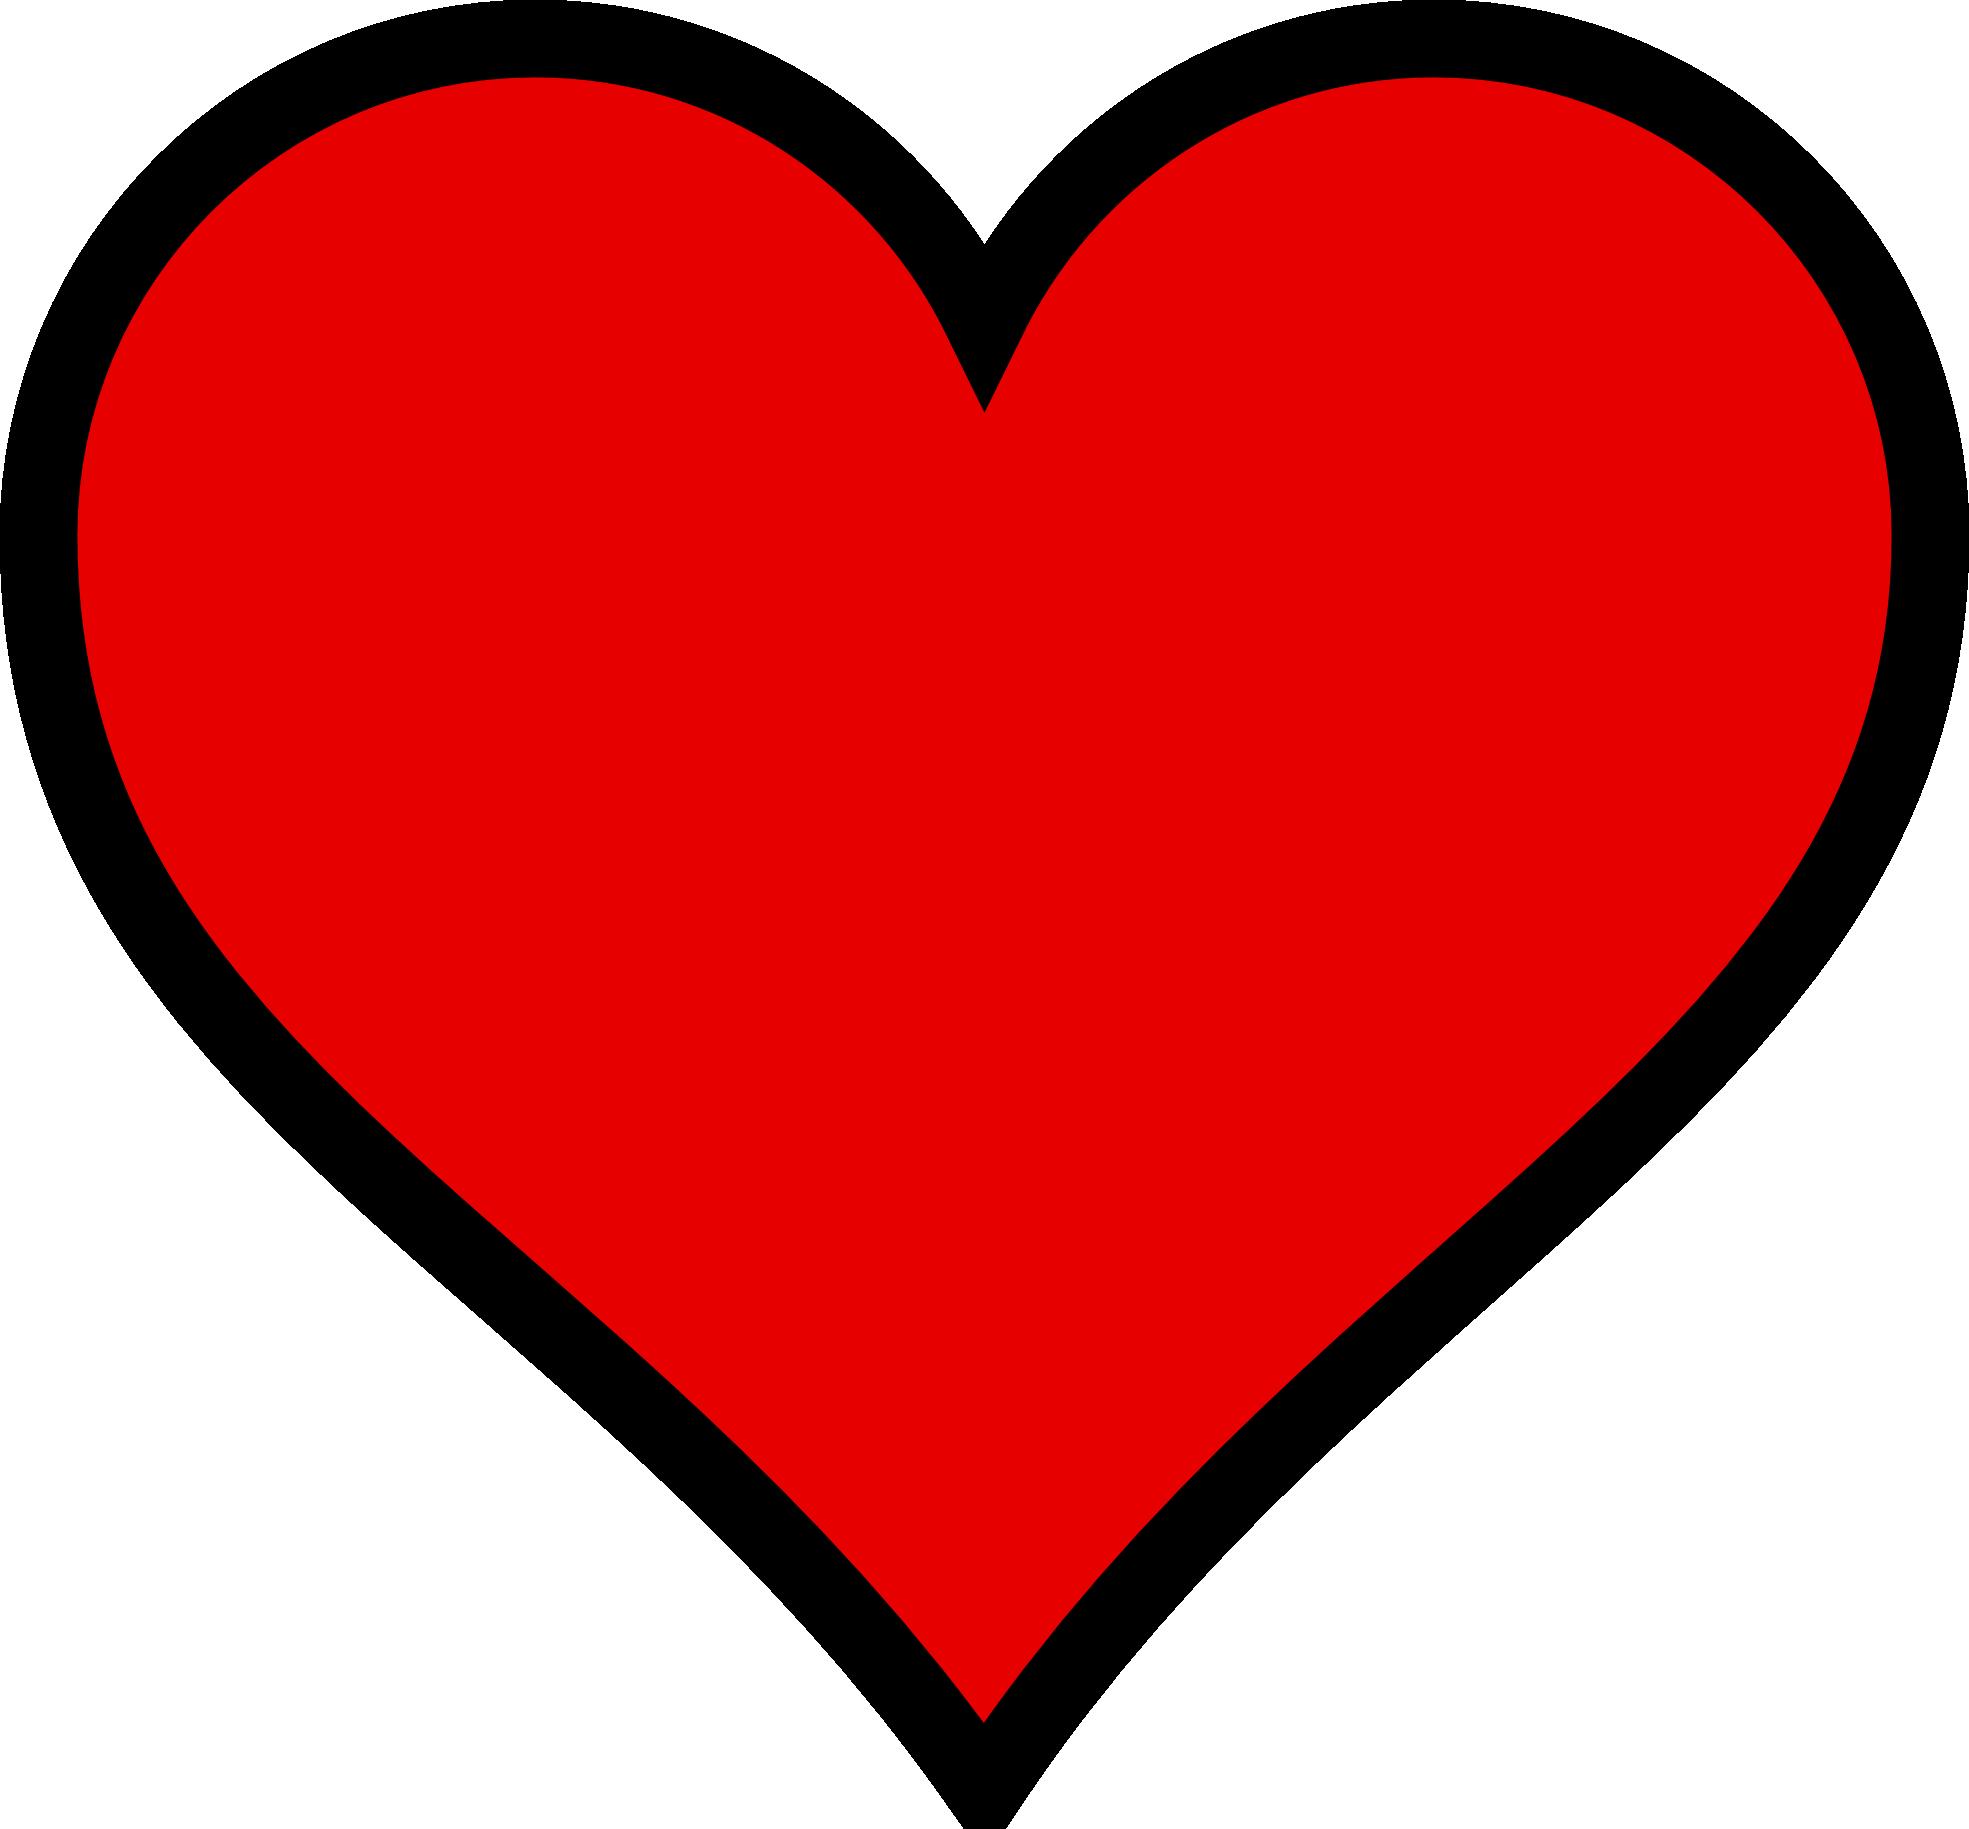 image heart clip art valentine heart 29 1969px png planet rh planetdinosaur wikia com heart clip art black and white heart clip art borders